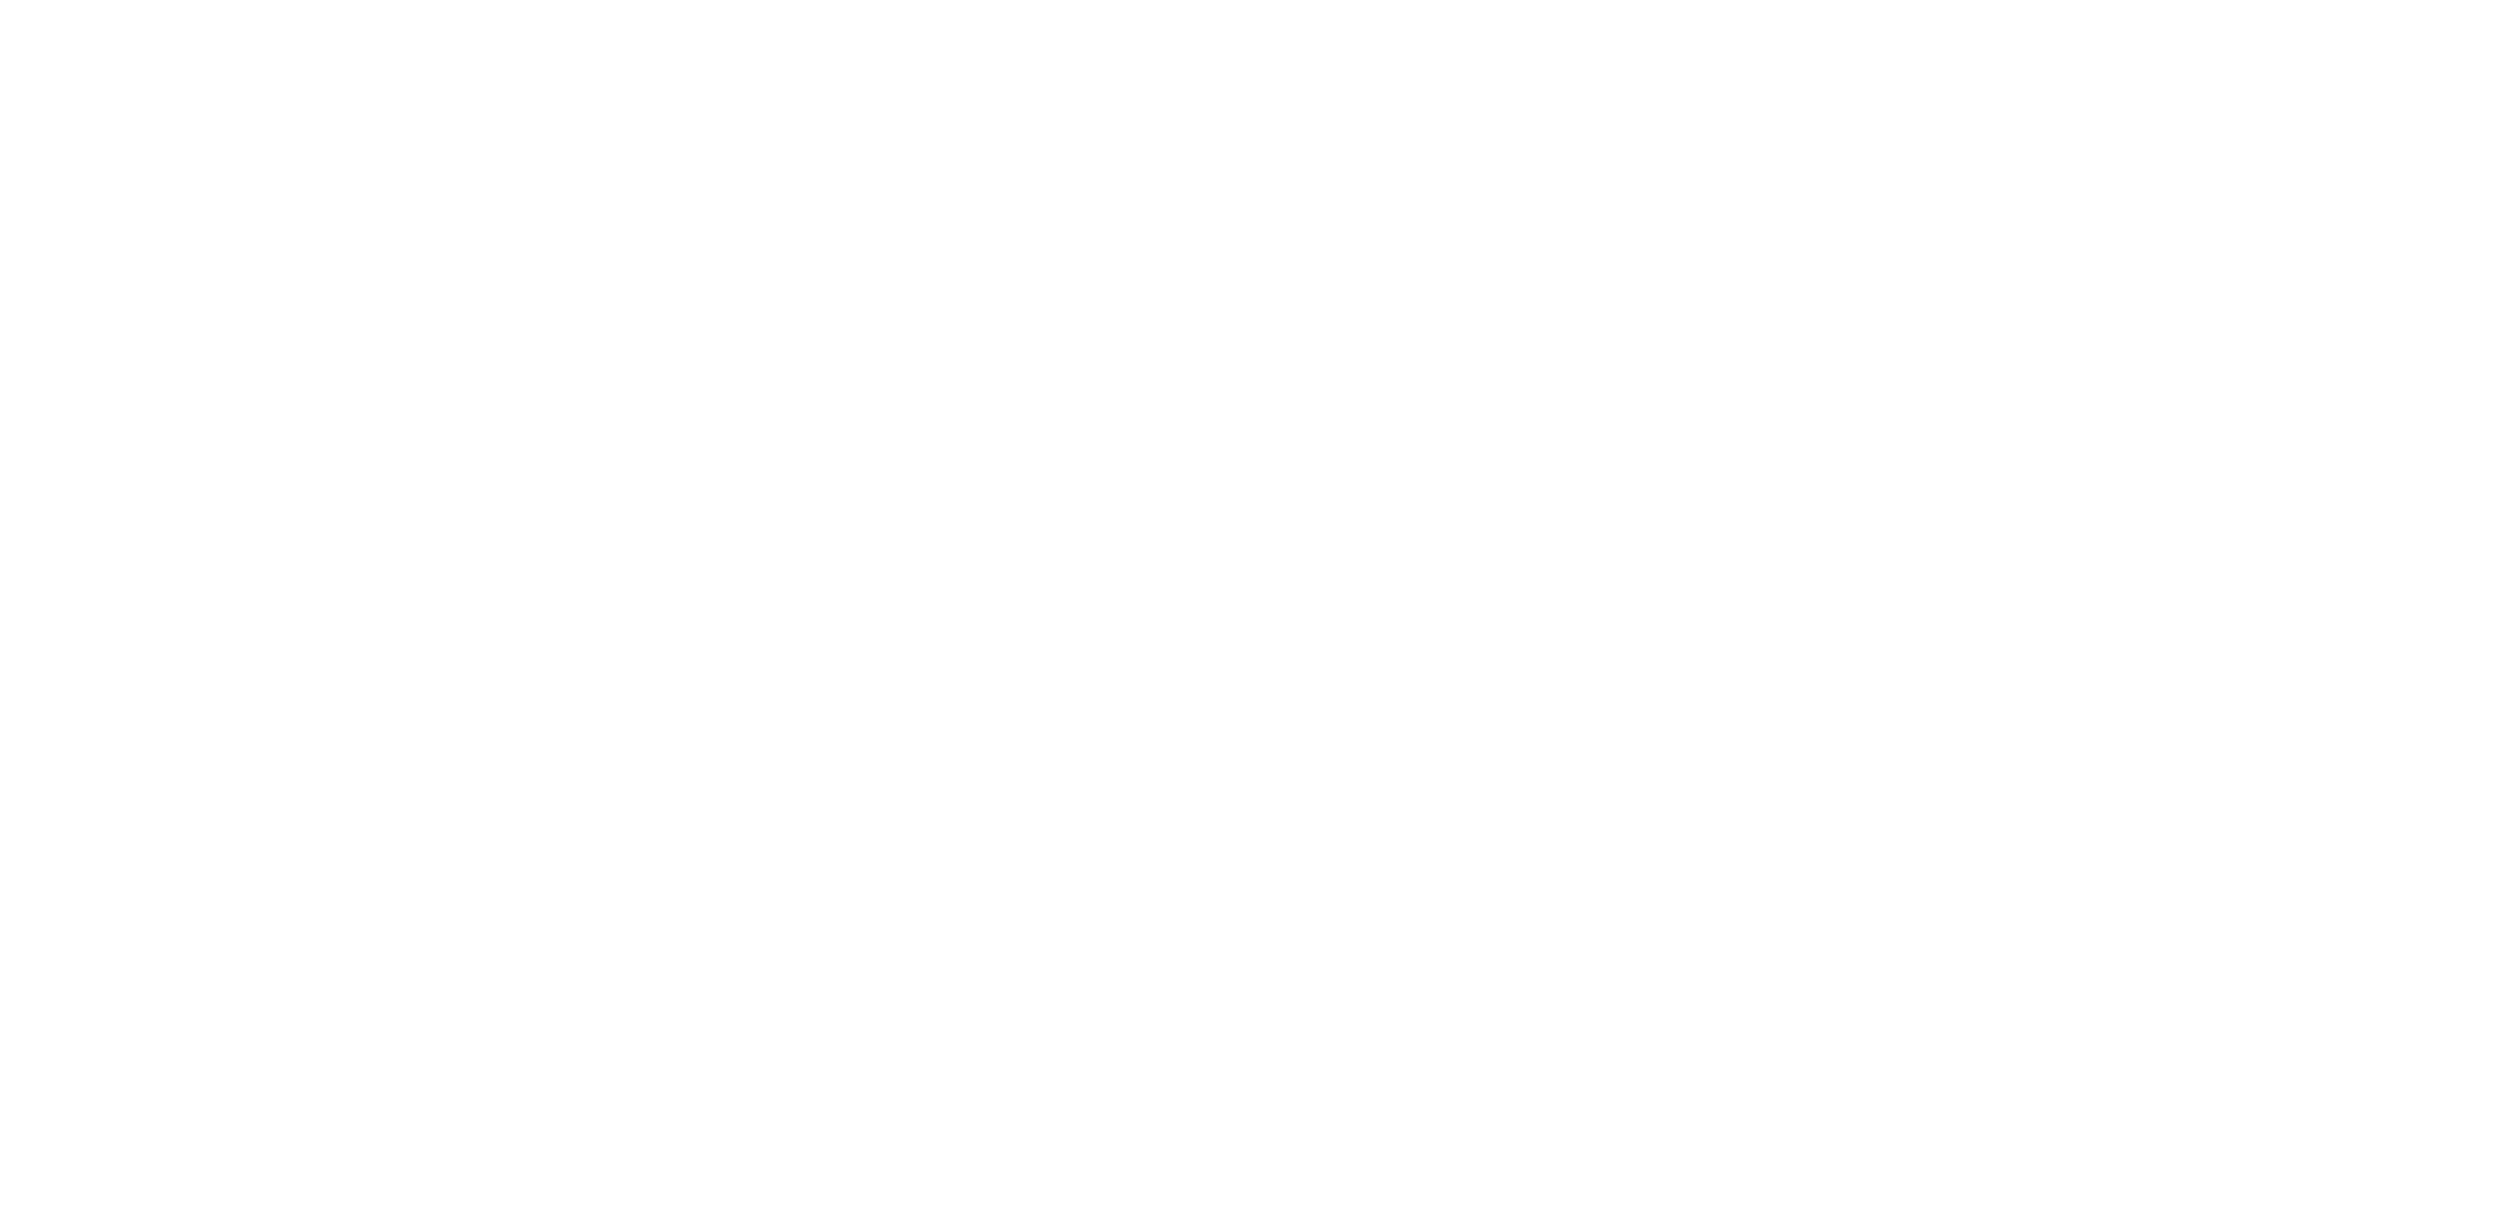 SentriRoofing_Logo_Final_White-2.png